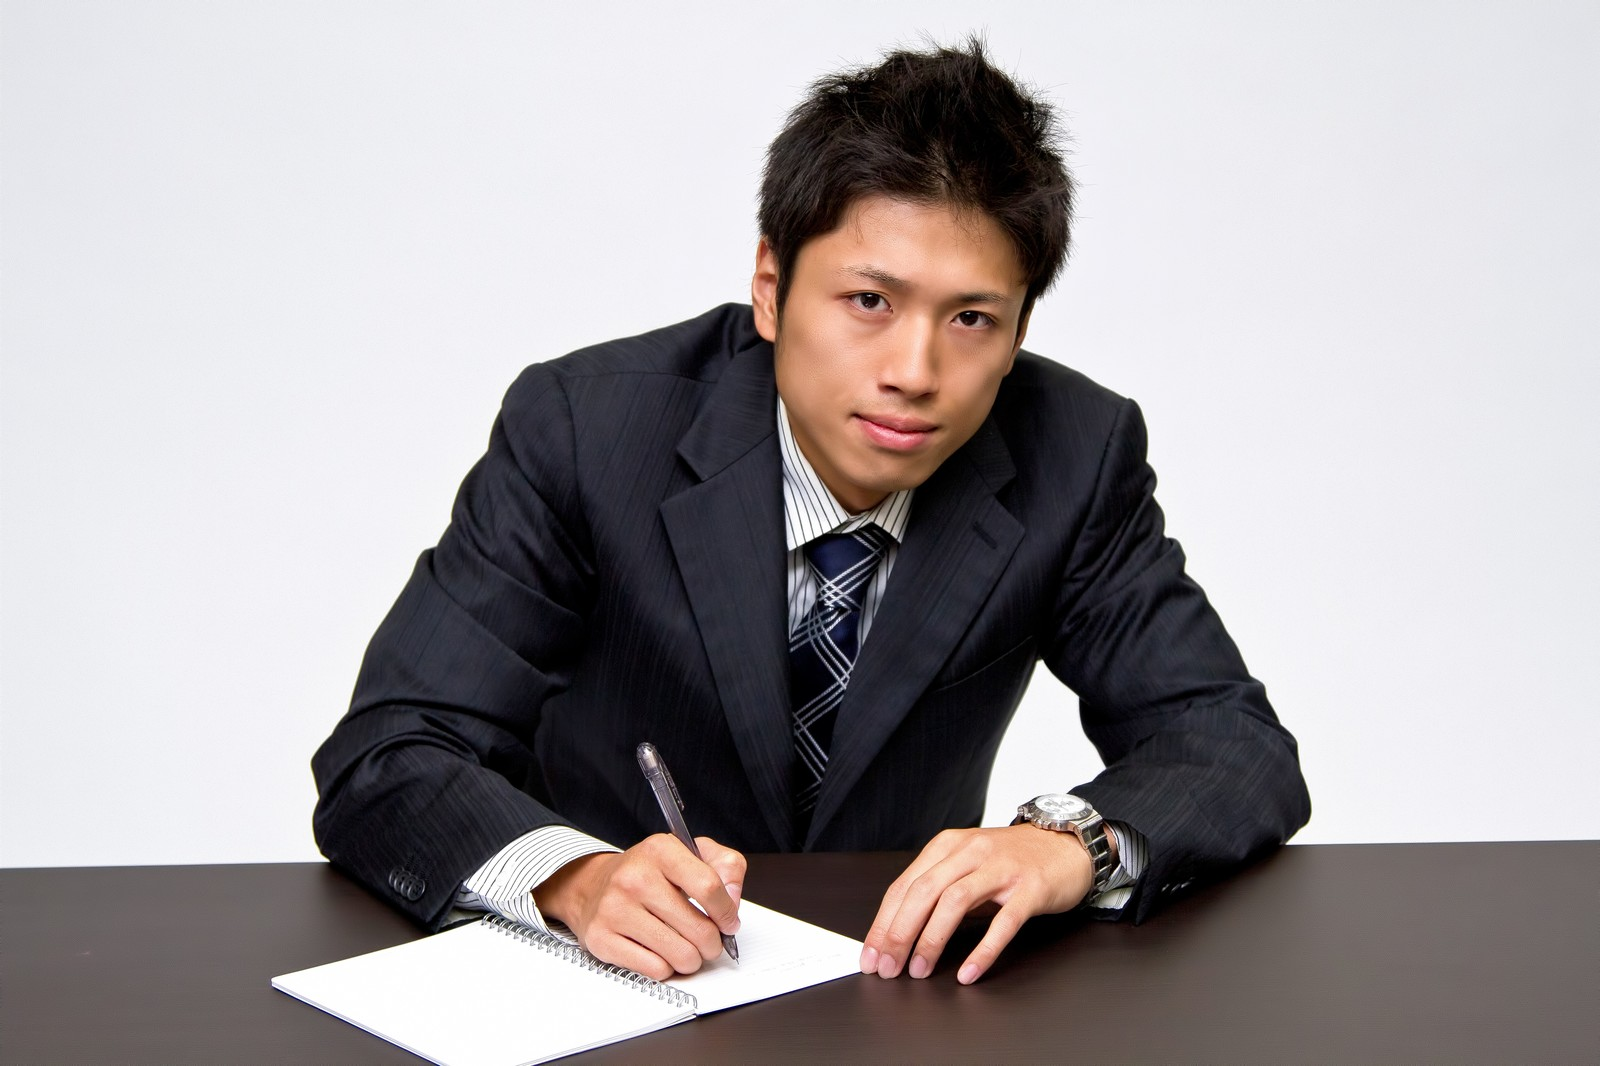 MOK_kyouhei-kijyounohuukei_TP_V.jpg